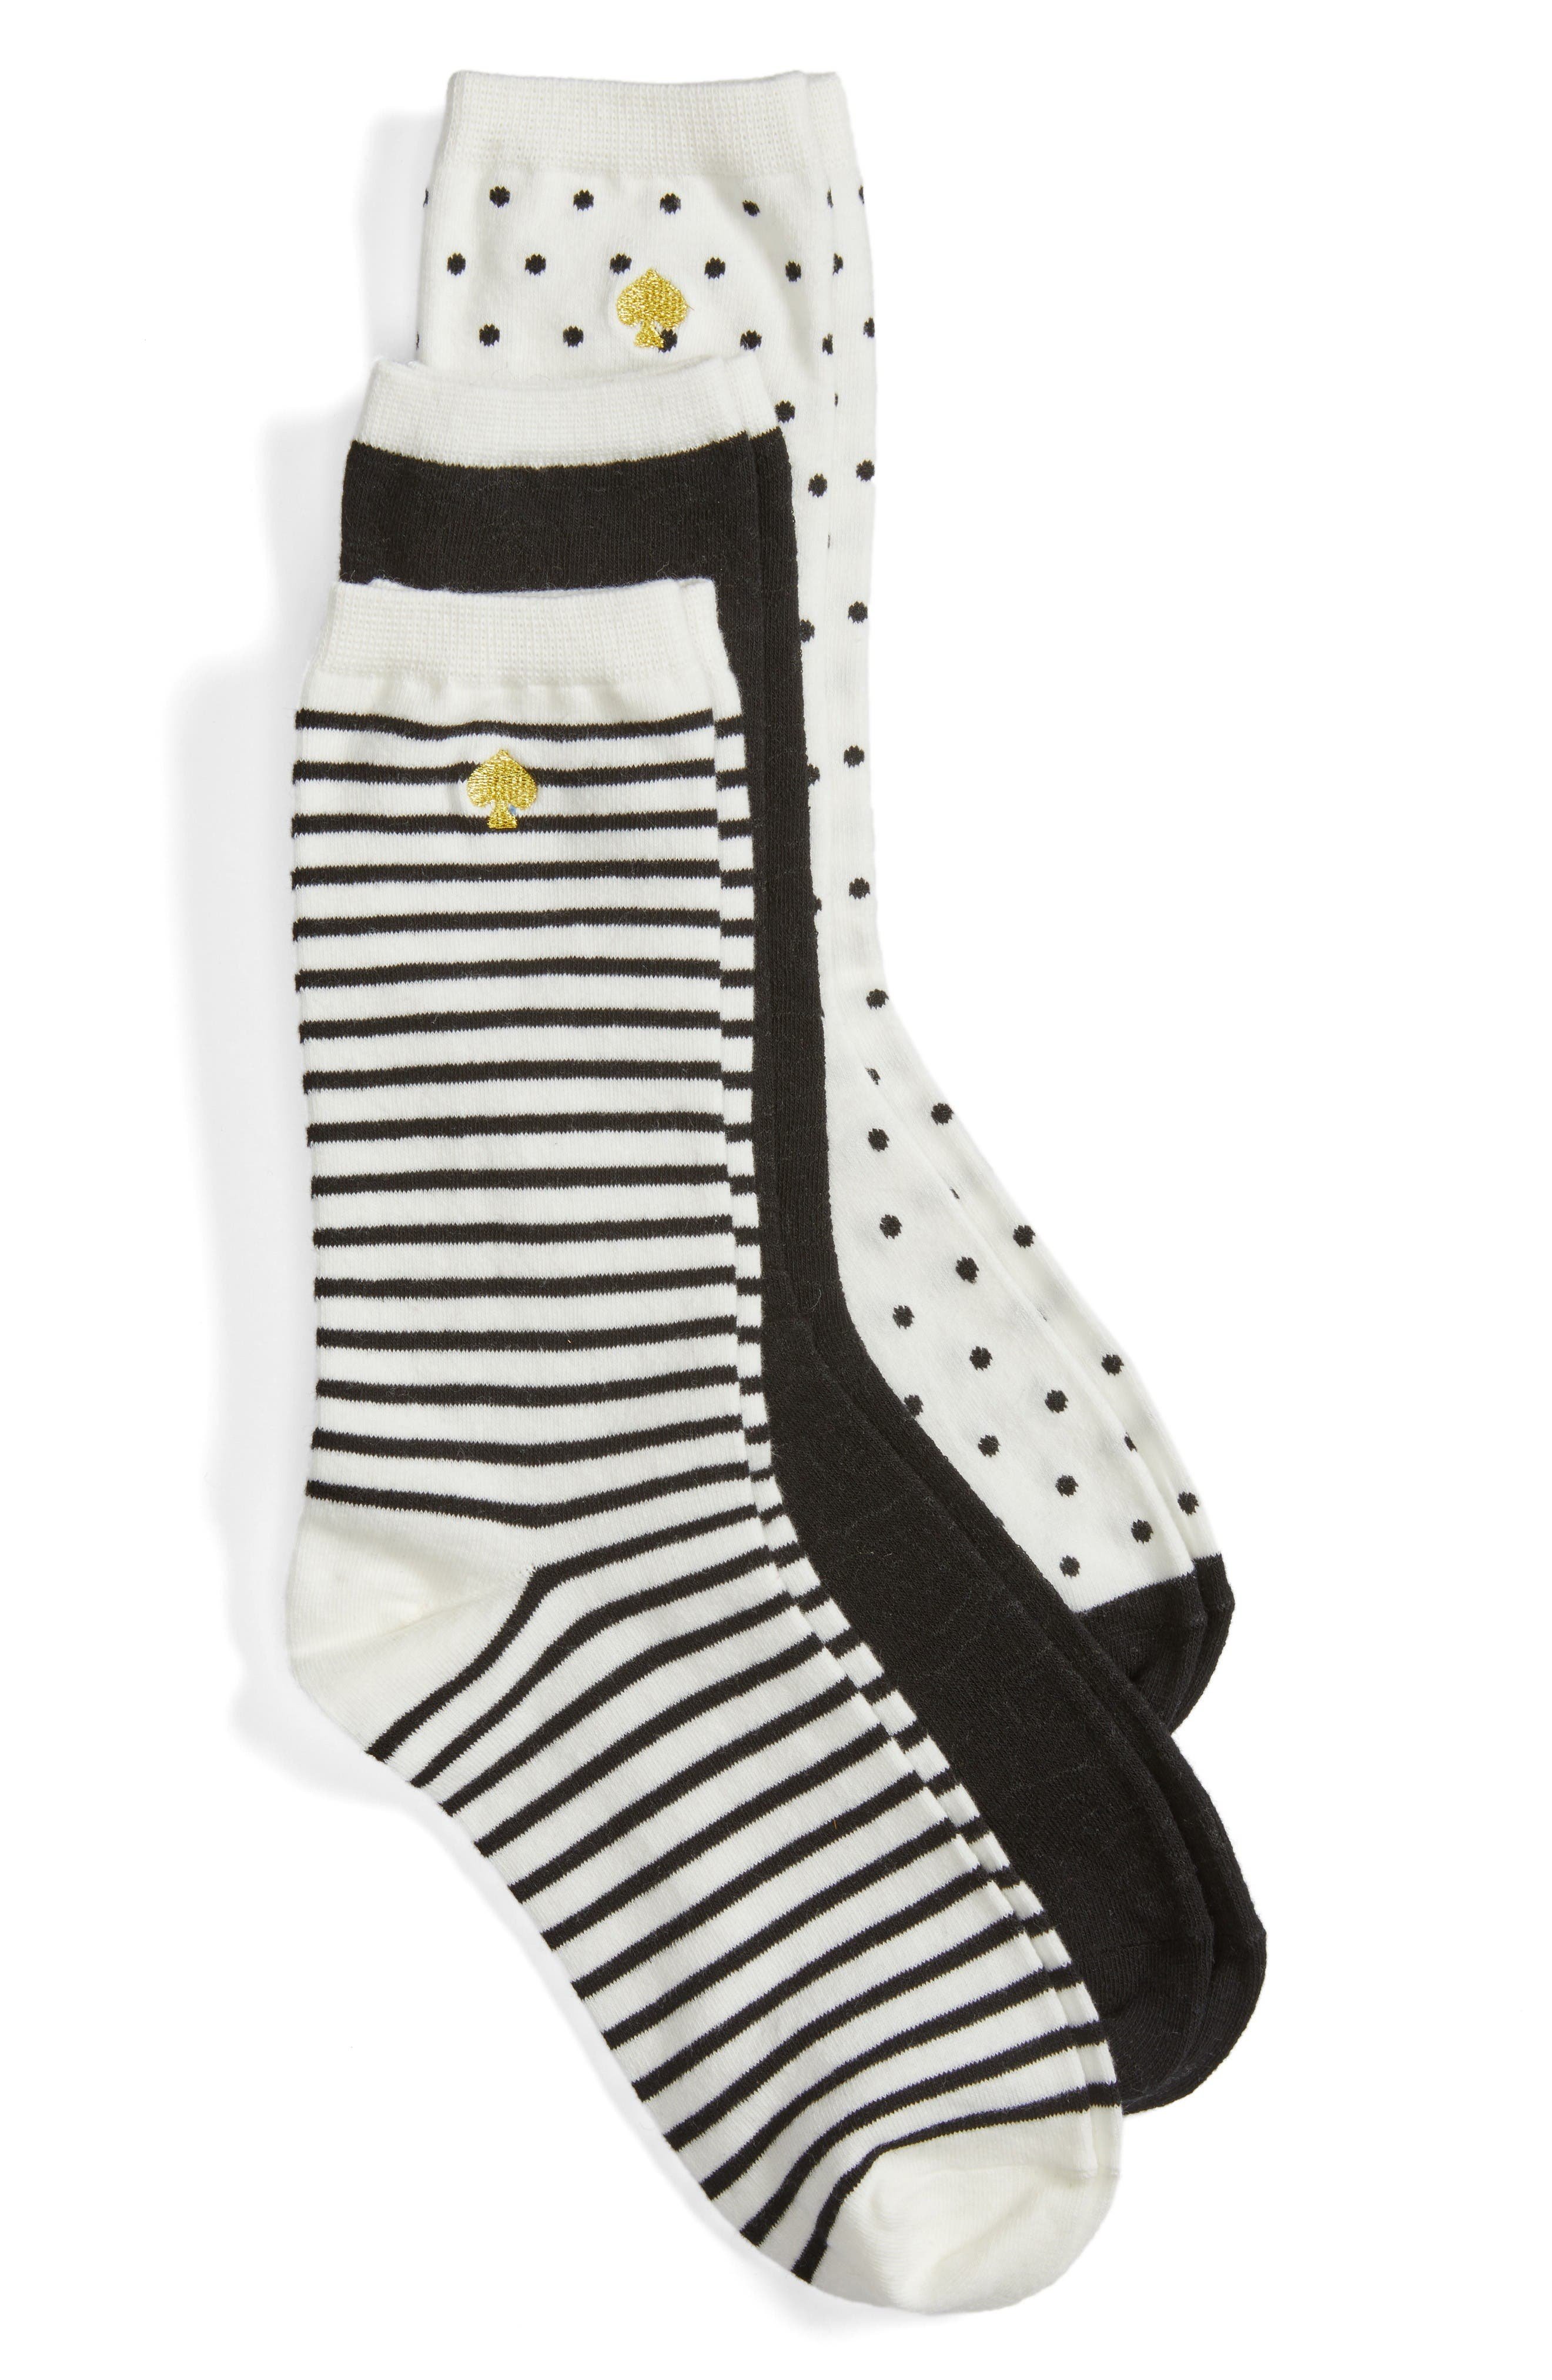 Alternate Image 1 Selected - kate spade new york assorted 3-pack crew socks